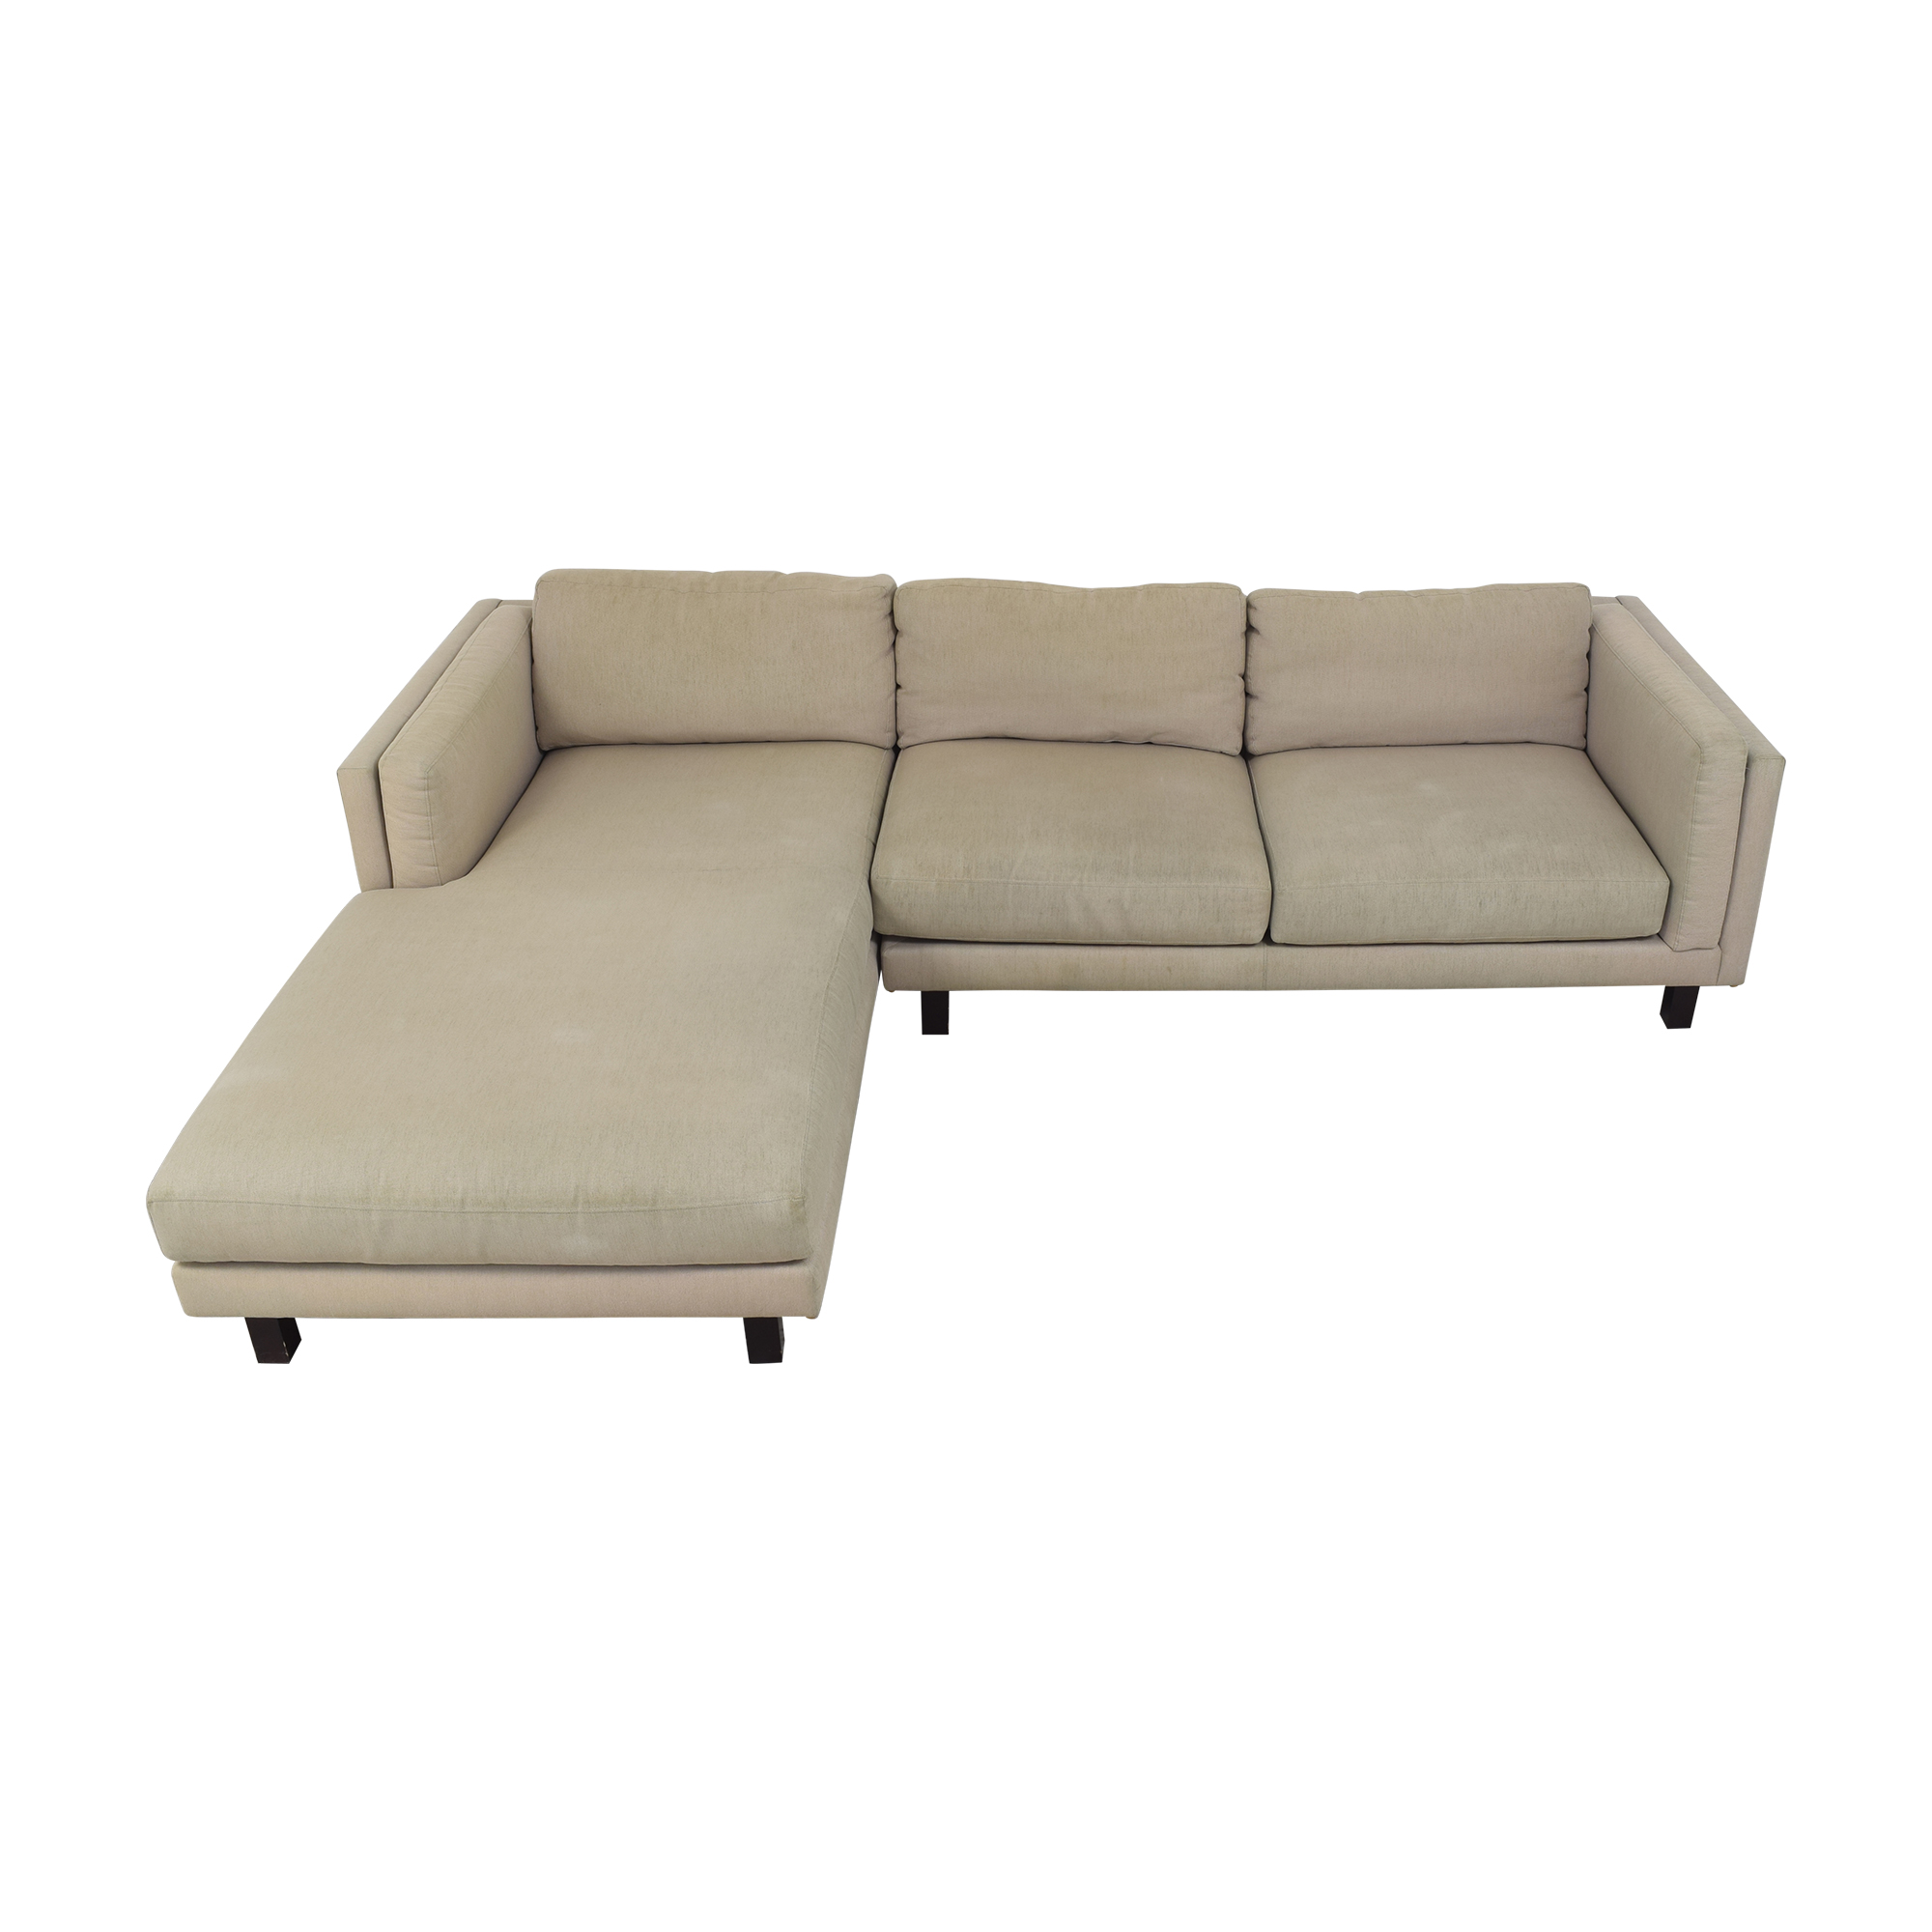 Room & Board Room & Board Chaise Sectional Sofa  nyc